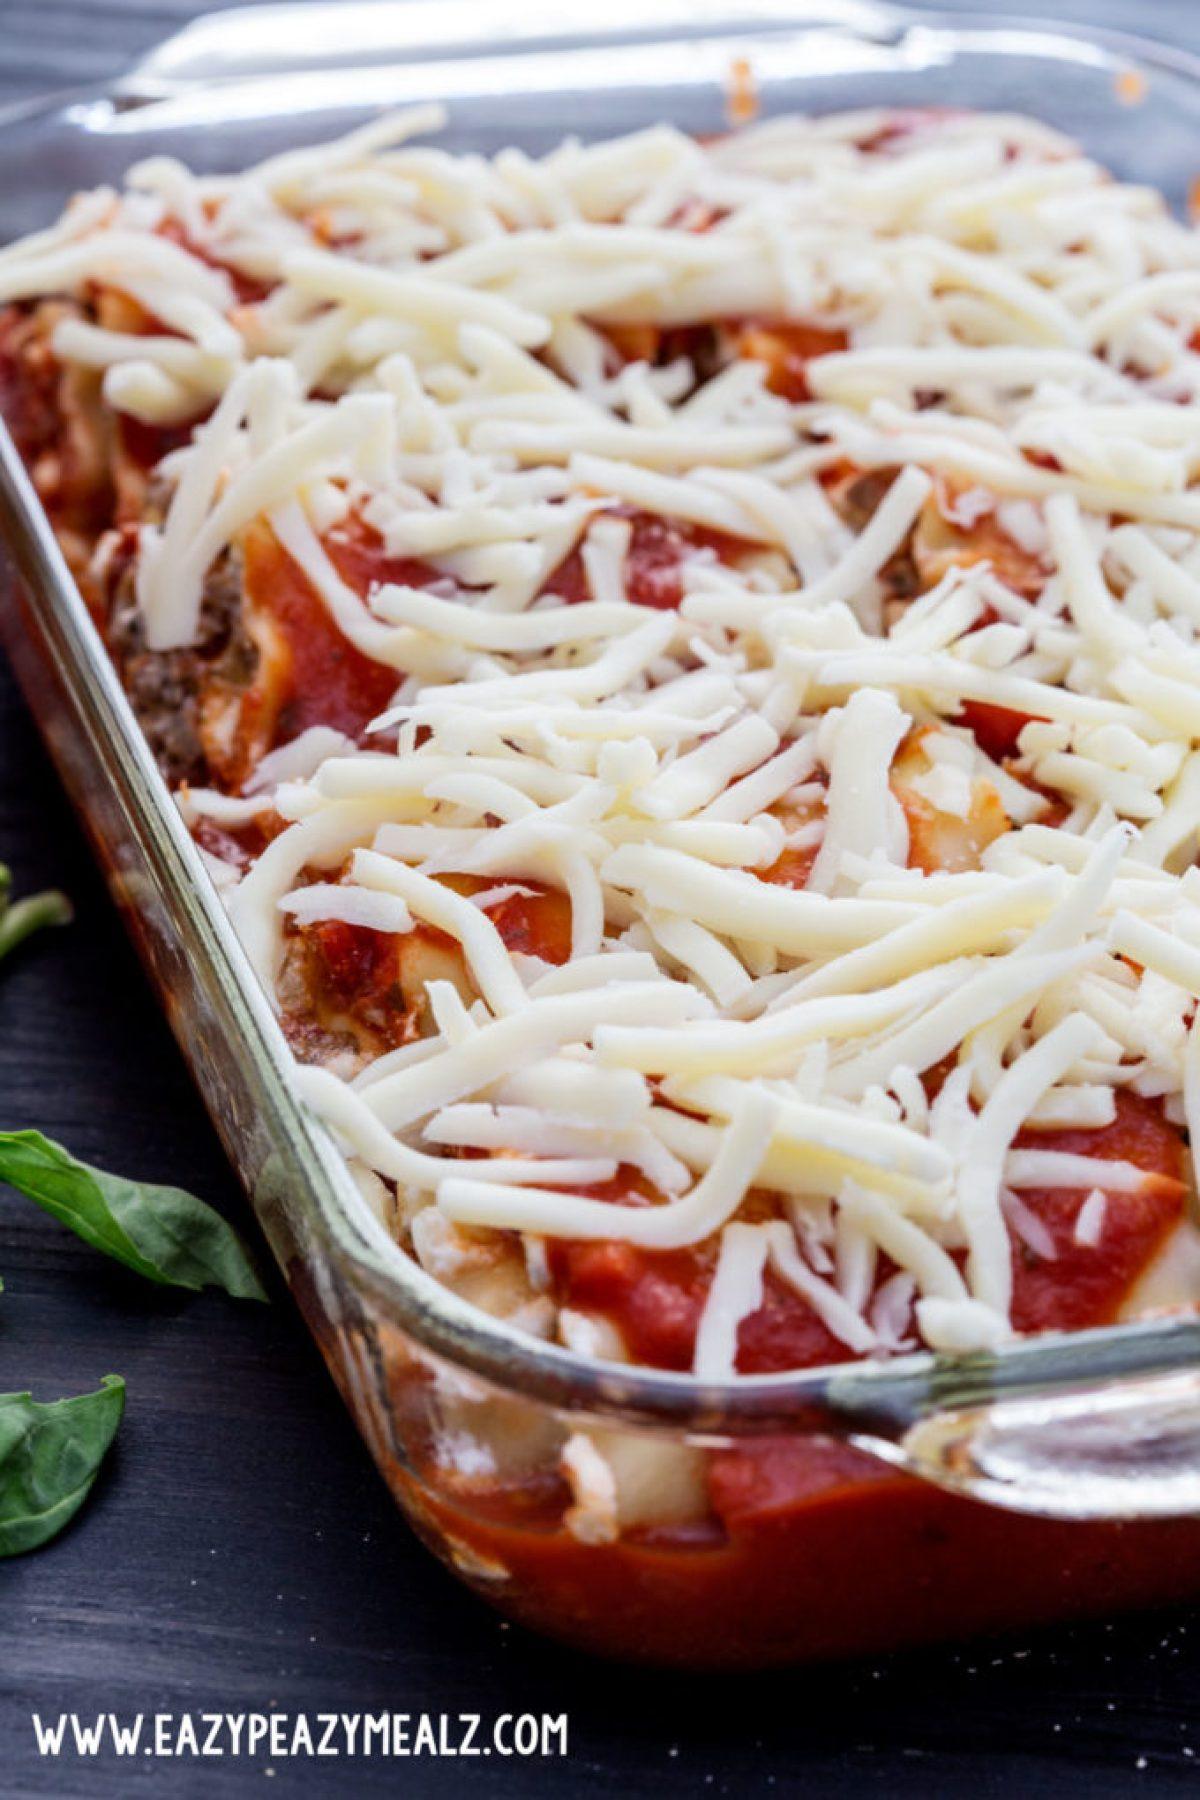 pre-baked-lasagna-roll-ups